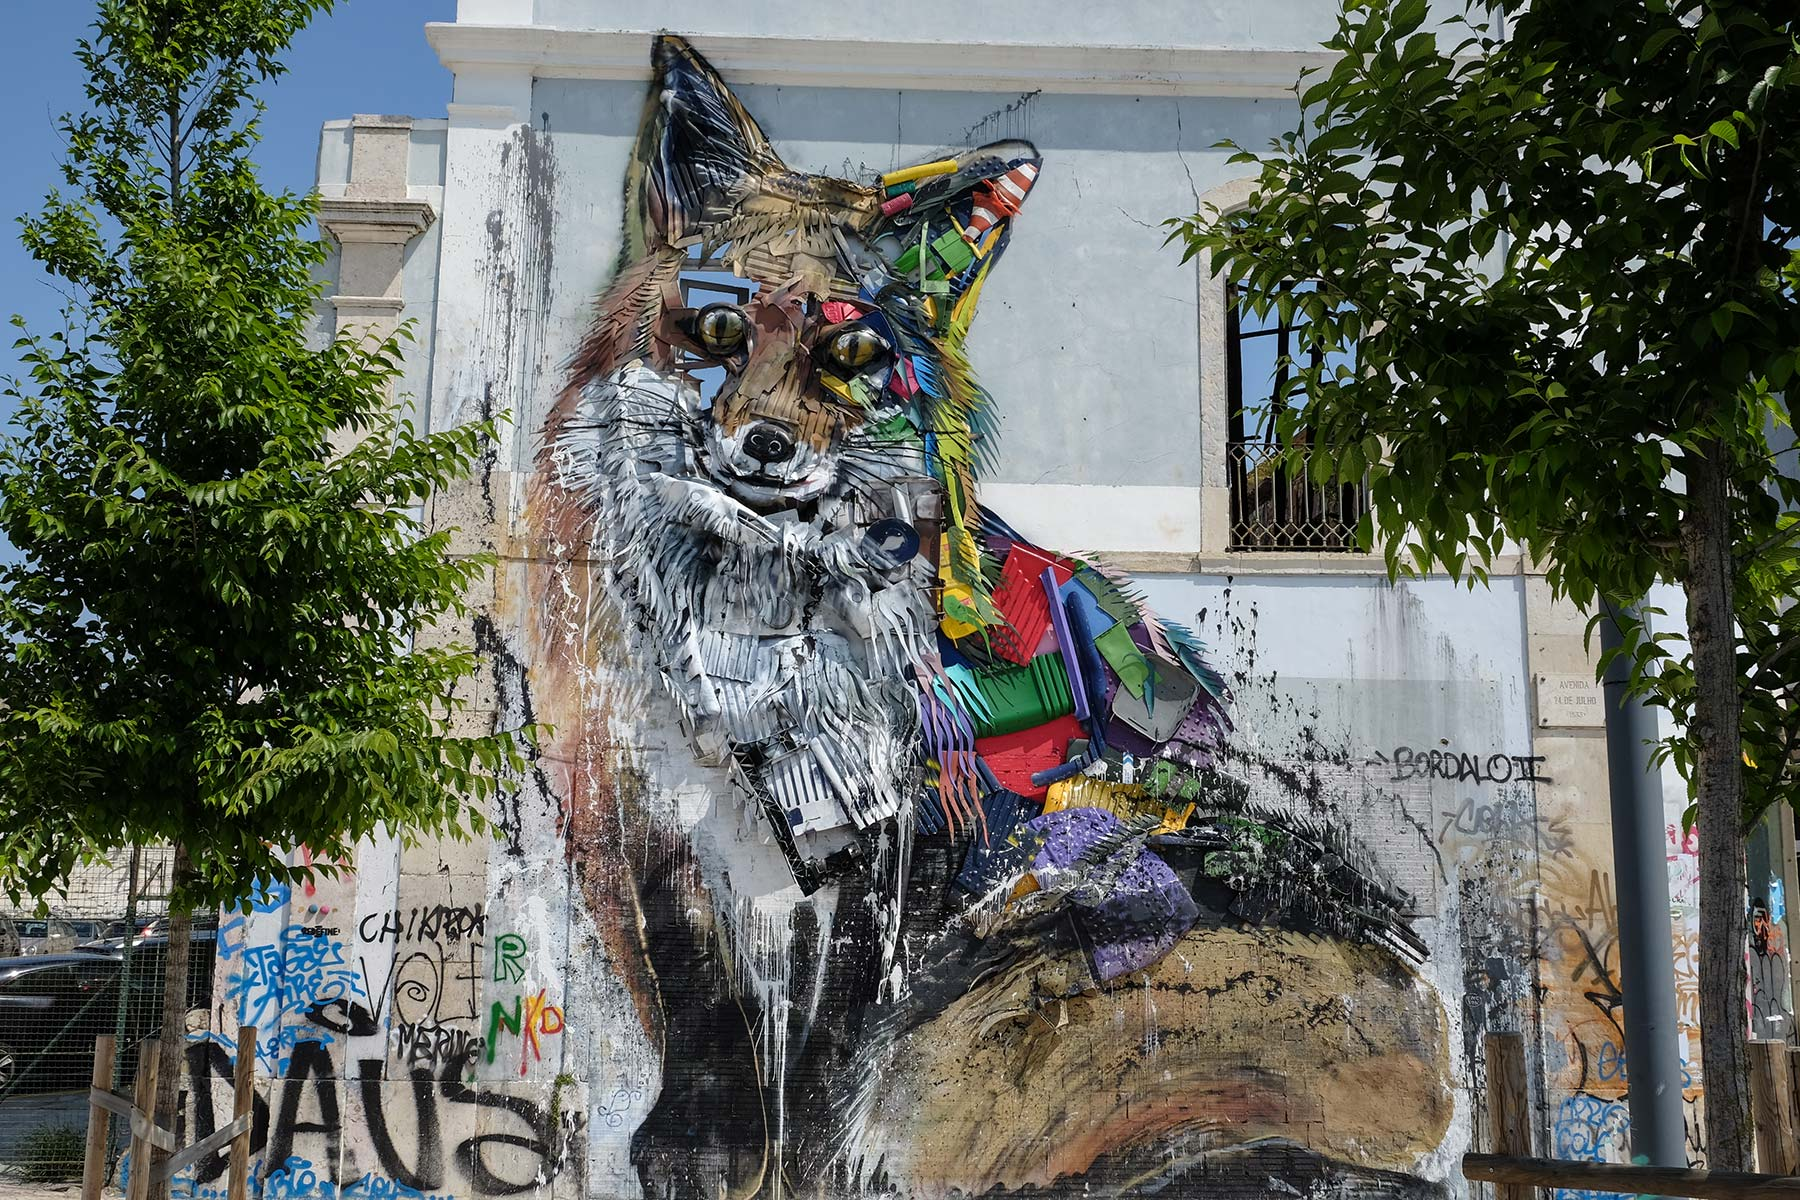 Fuchs Installation des Künstlers Bordalo II in Lissabon, Portugal